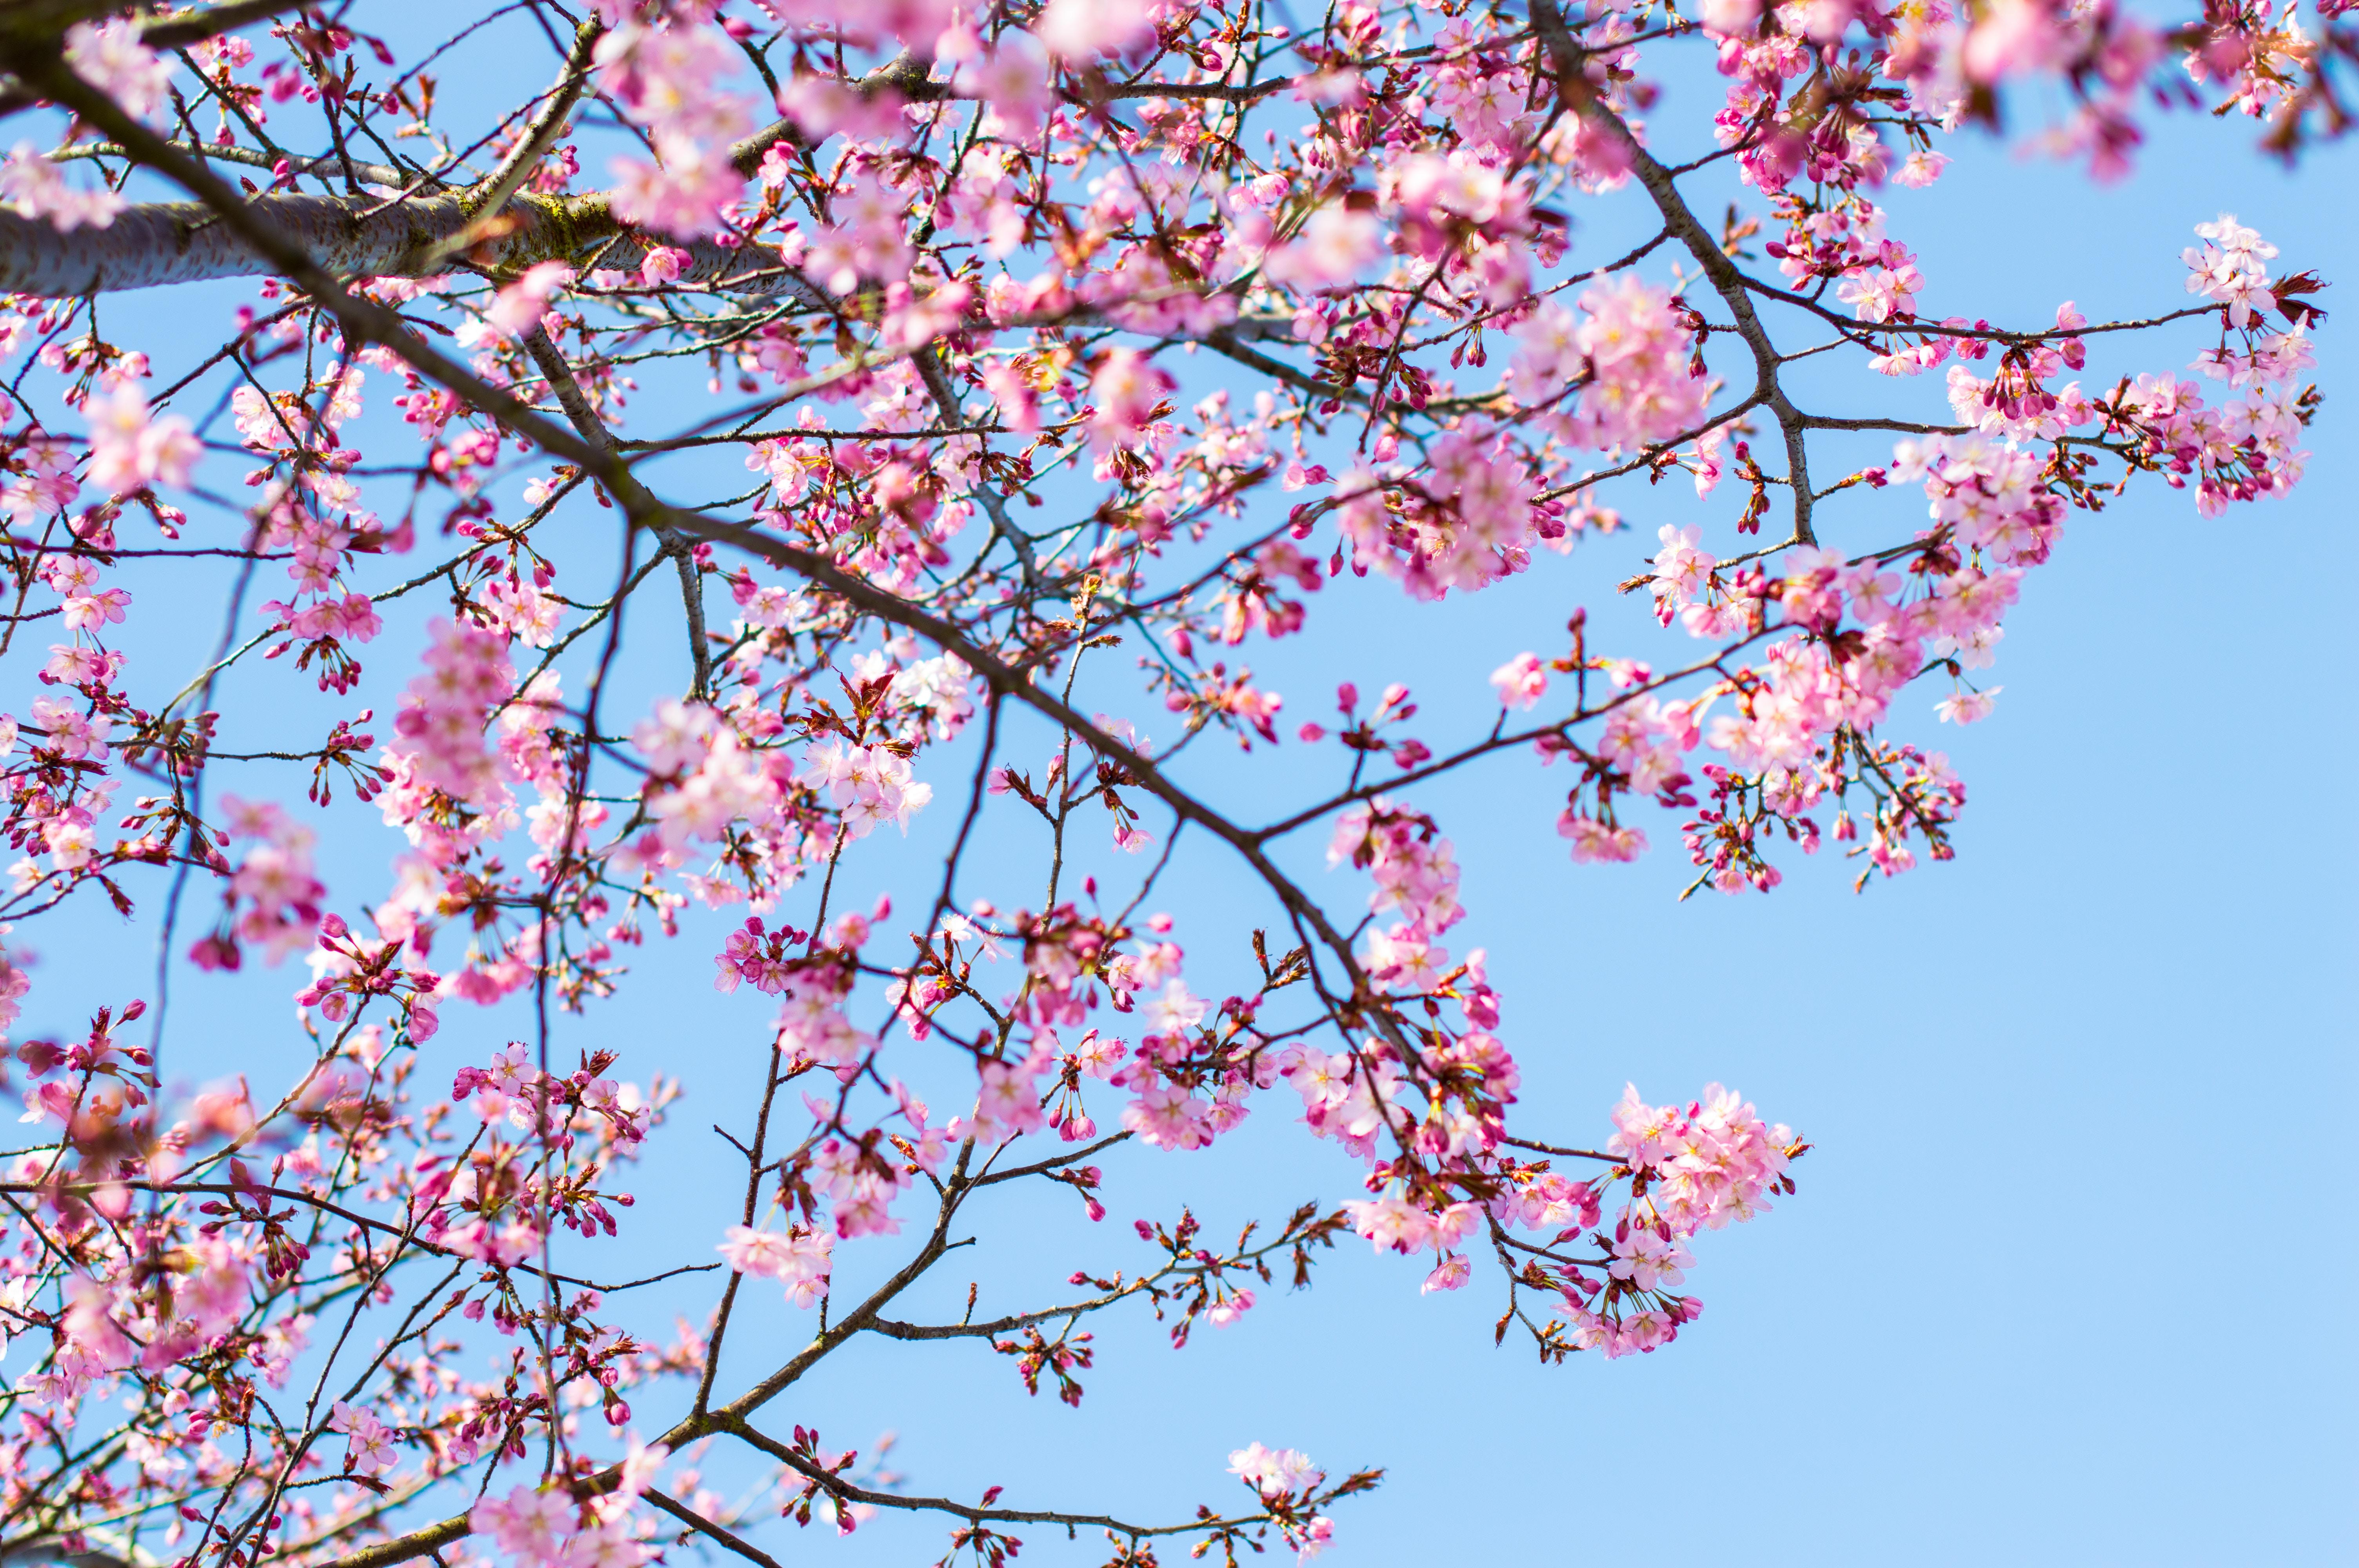 Pink cherry blossom tree against a blue sky